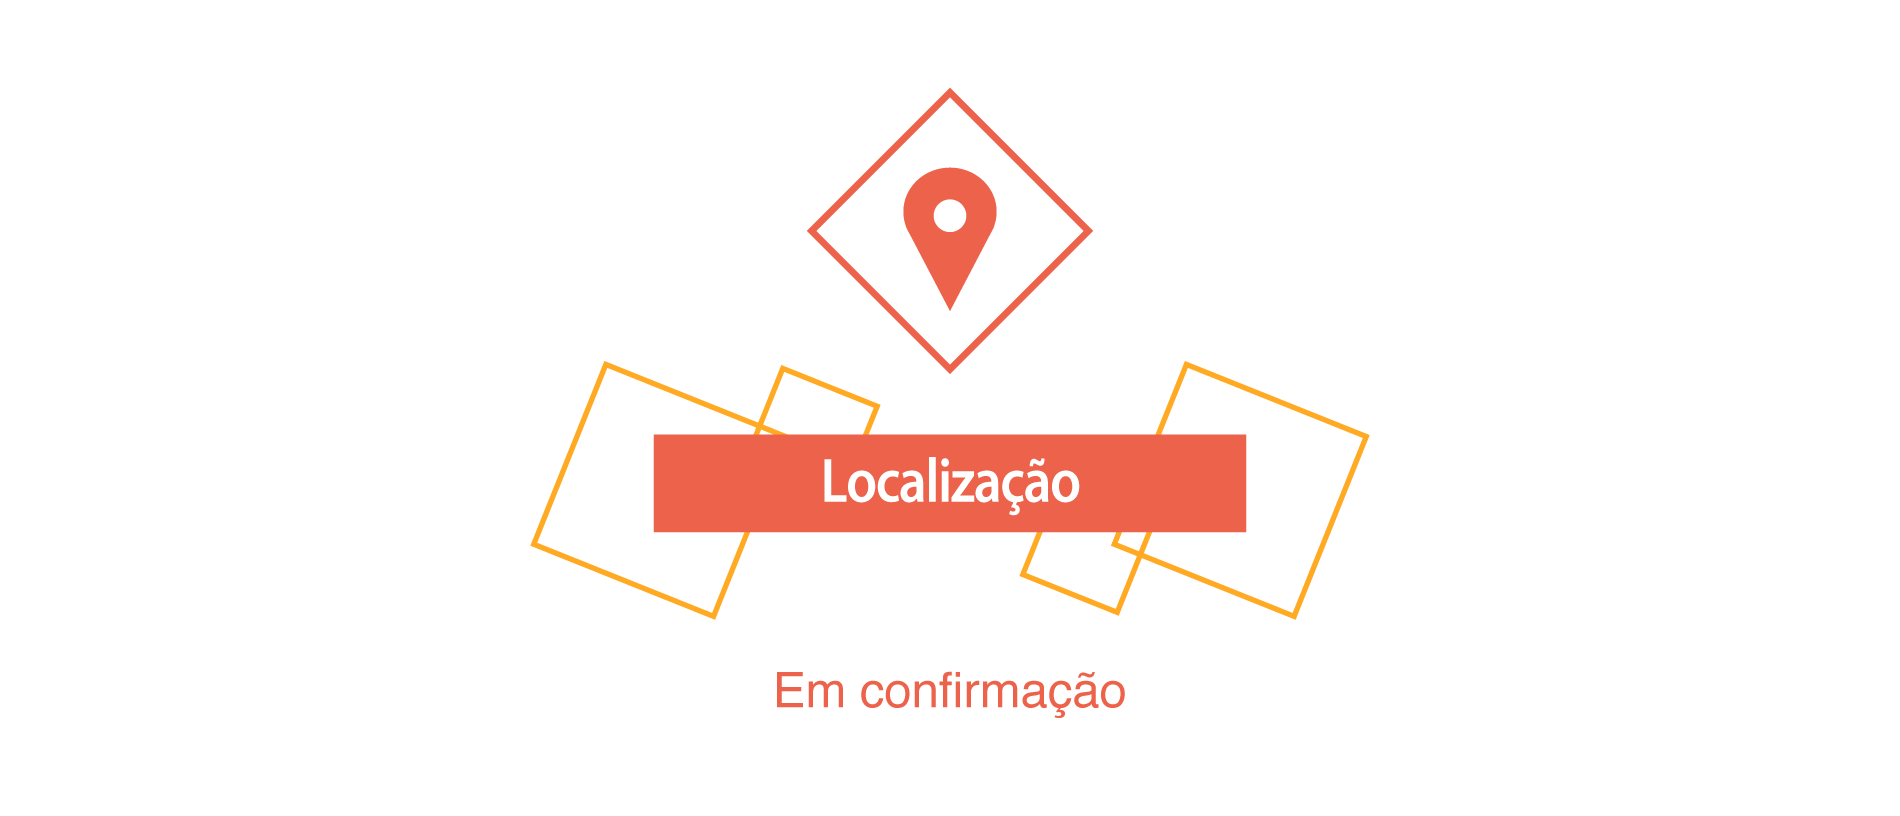 https://www.mestregp.com.br/wp-content/uploads/2018/03/Pagina-Fórum-SP-b-local-1900x816.png